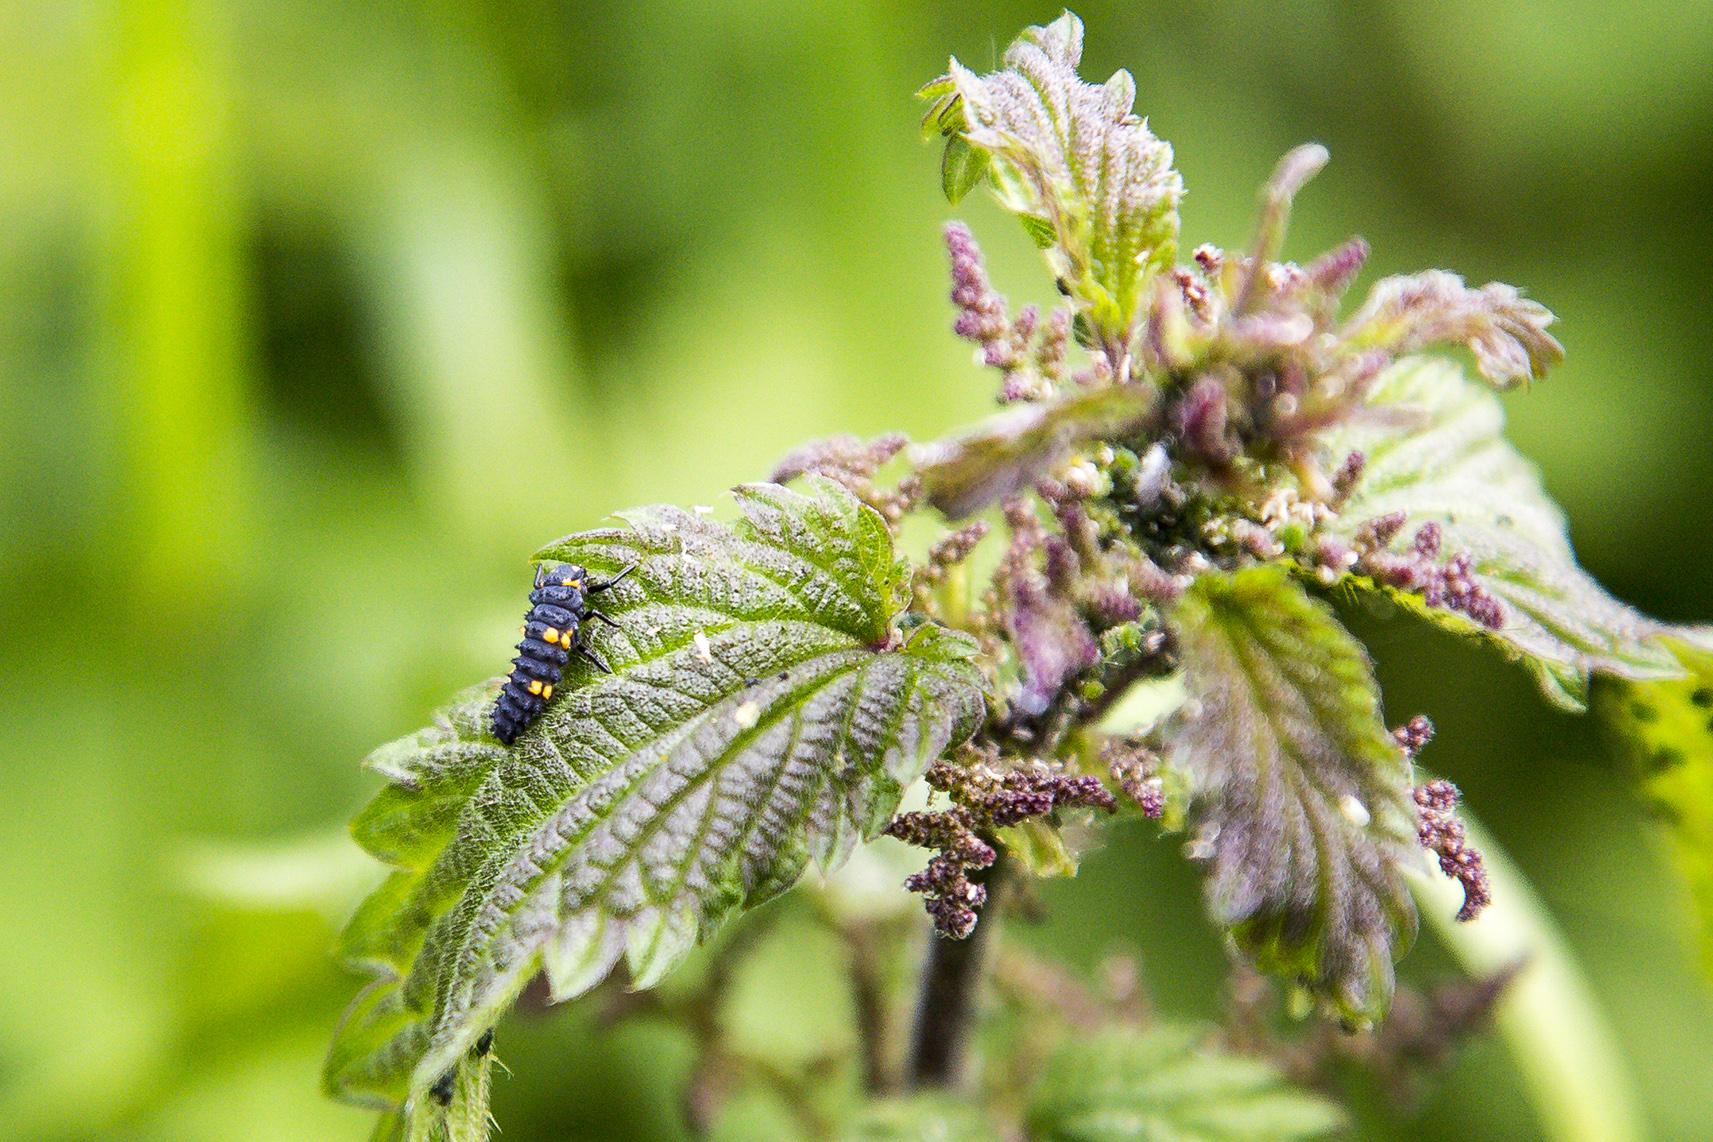 naturaliste-larve-libellules-2015-marie-colette-becker-06